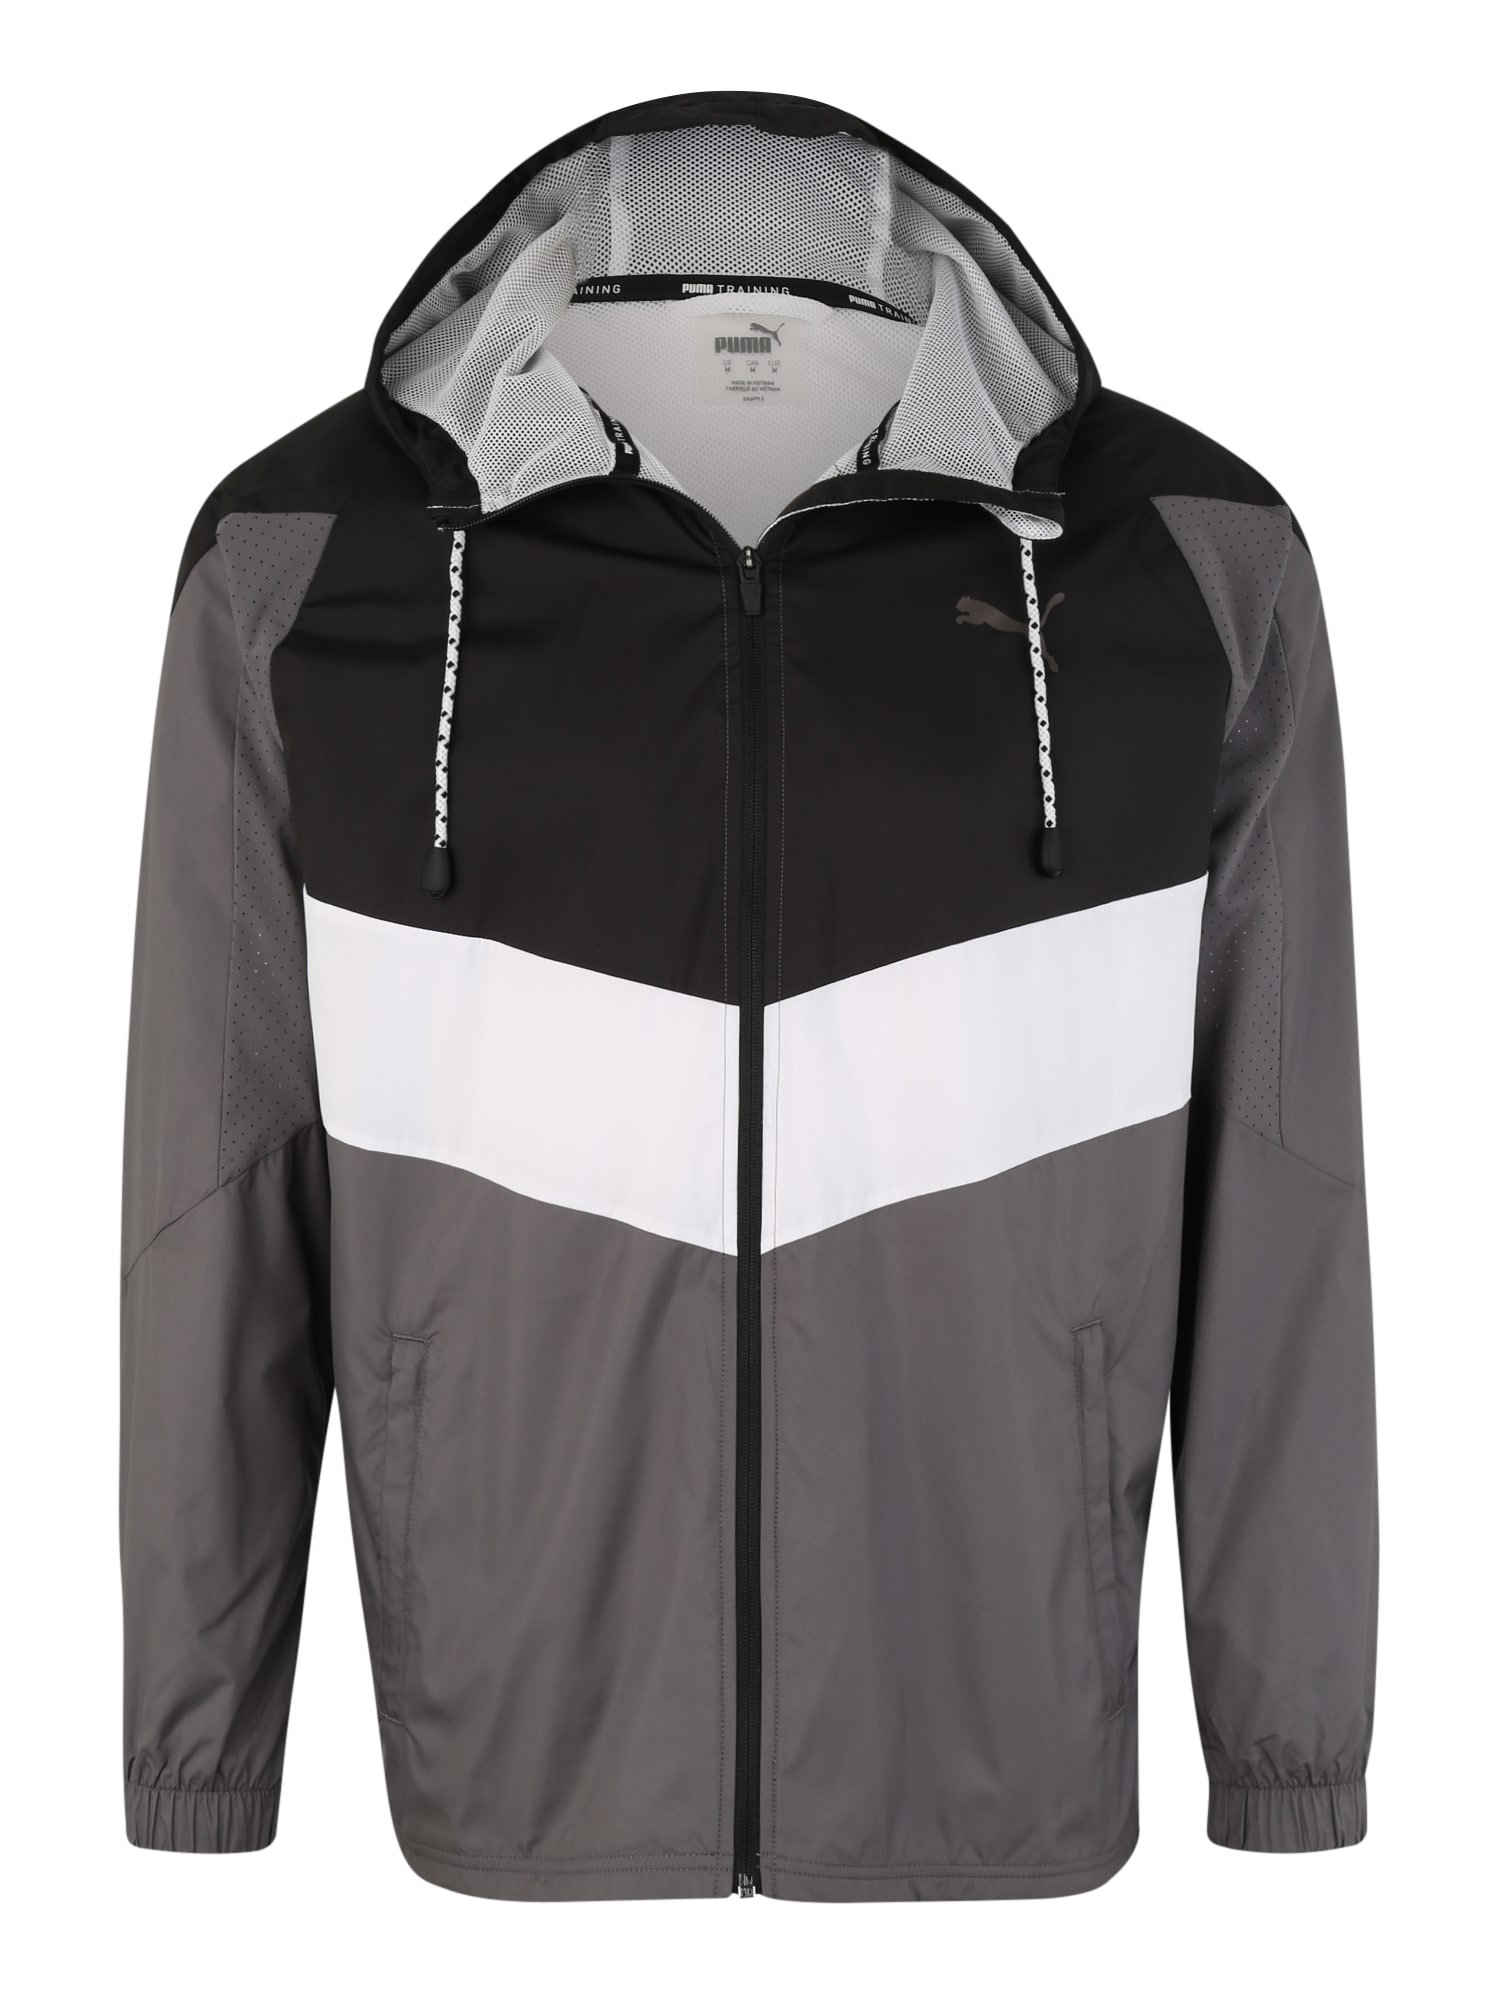 Sportovní bunda Reactive tmavě šedá černá bílá PUMA